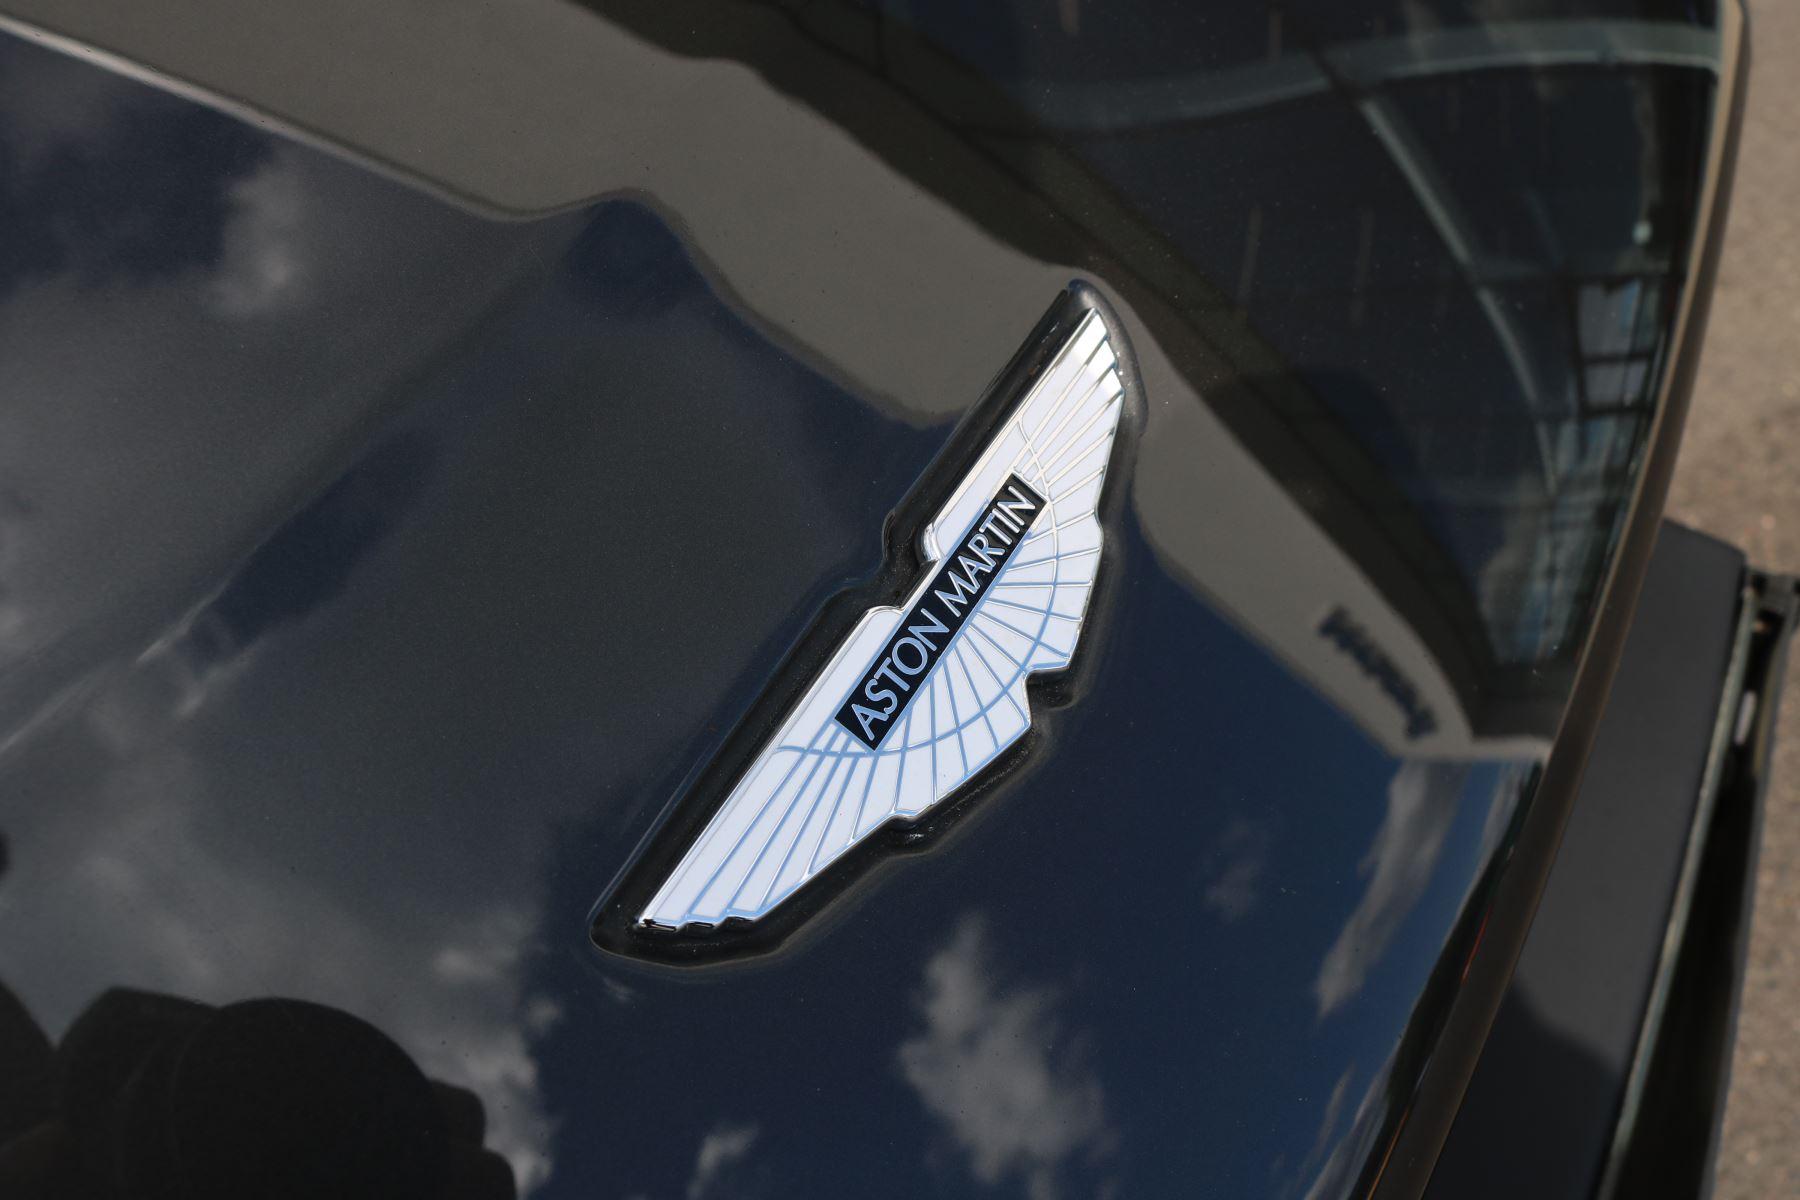 Aston Martin V12 Vantage 2dr image 15